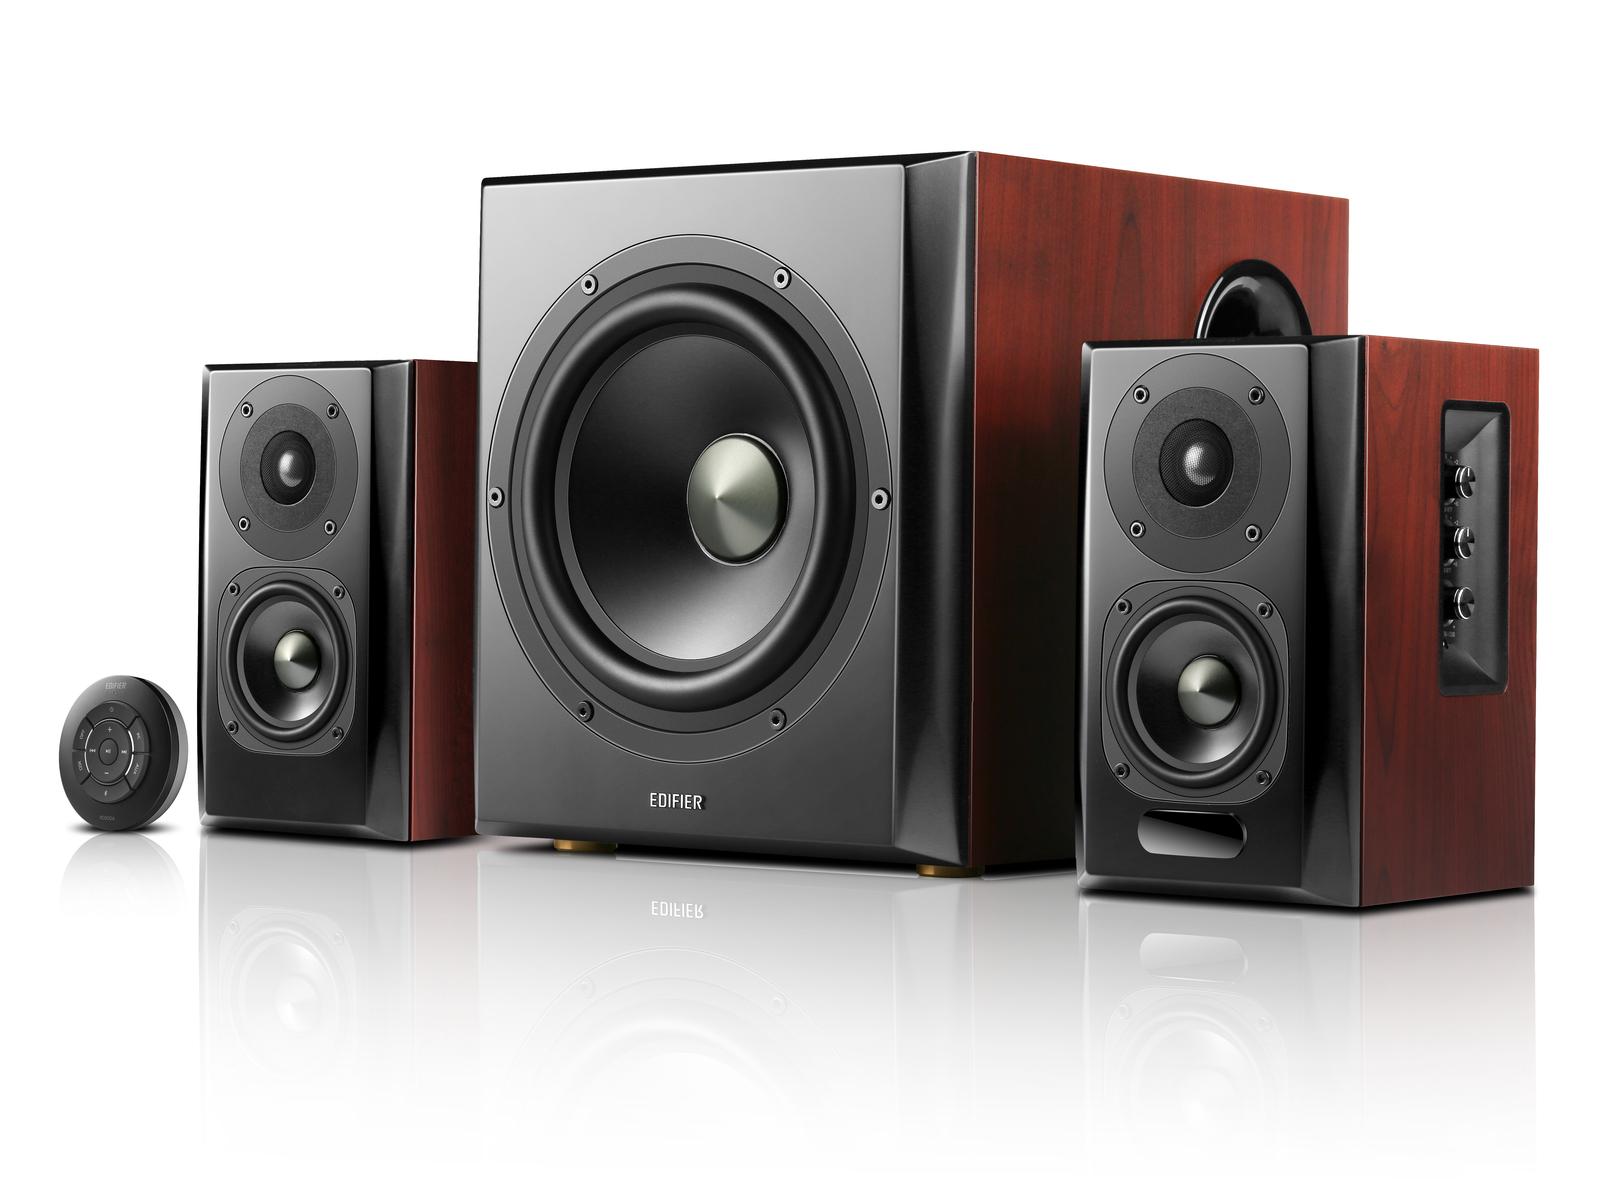 Edifier S350DB 2.1 Speakers image